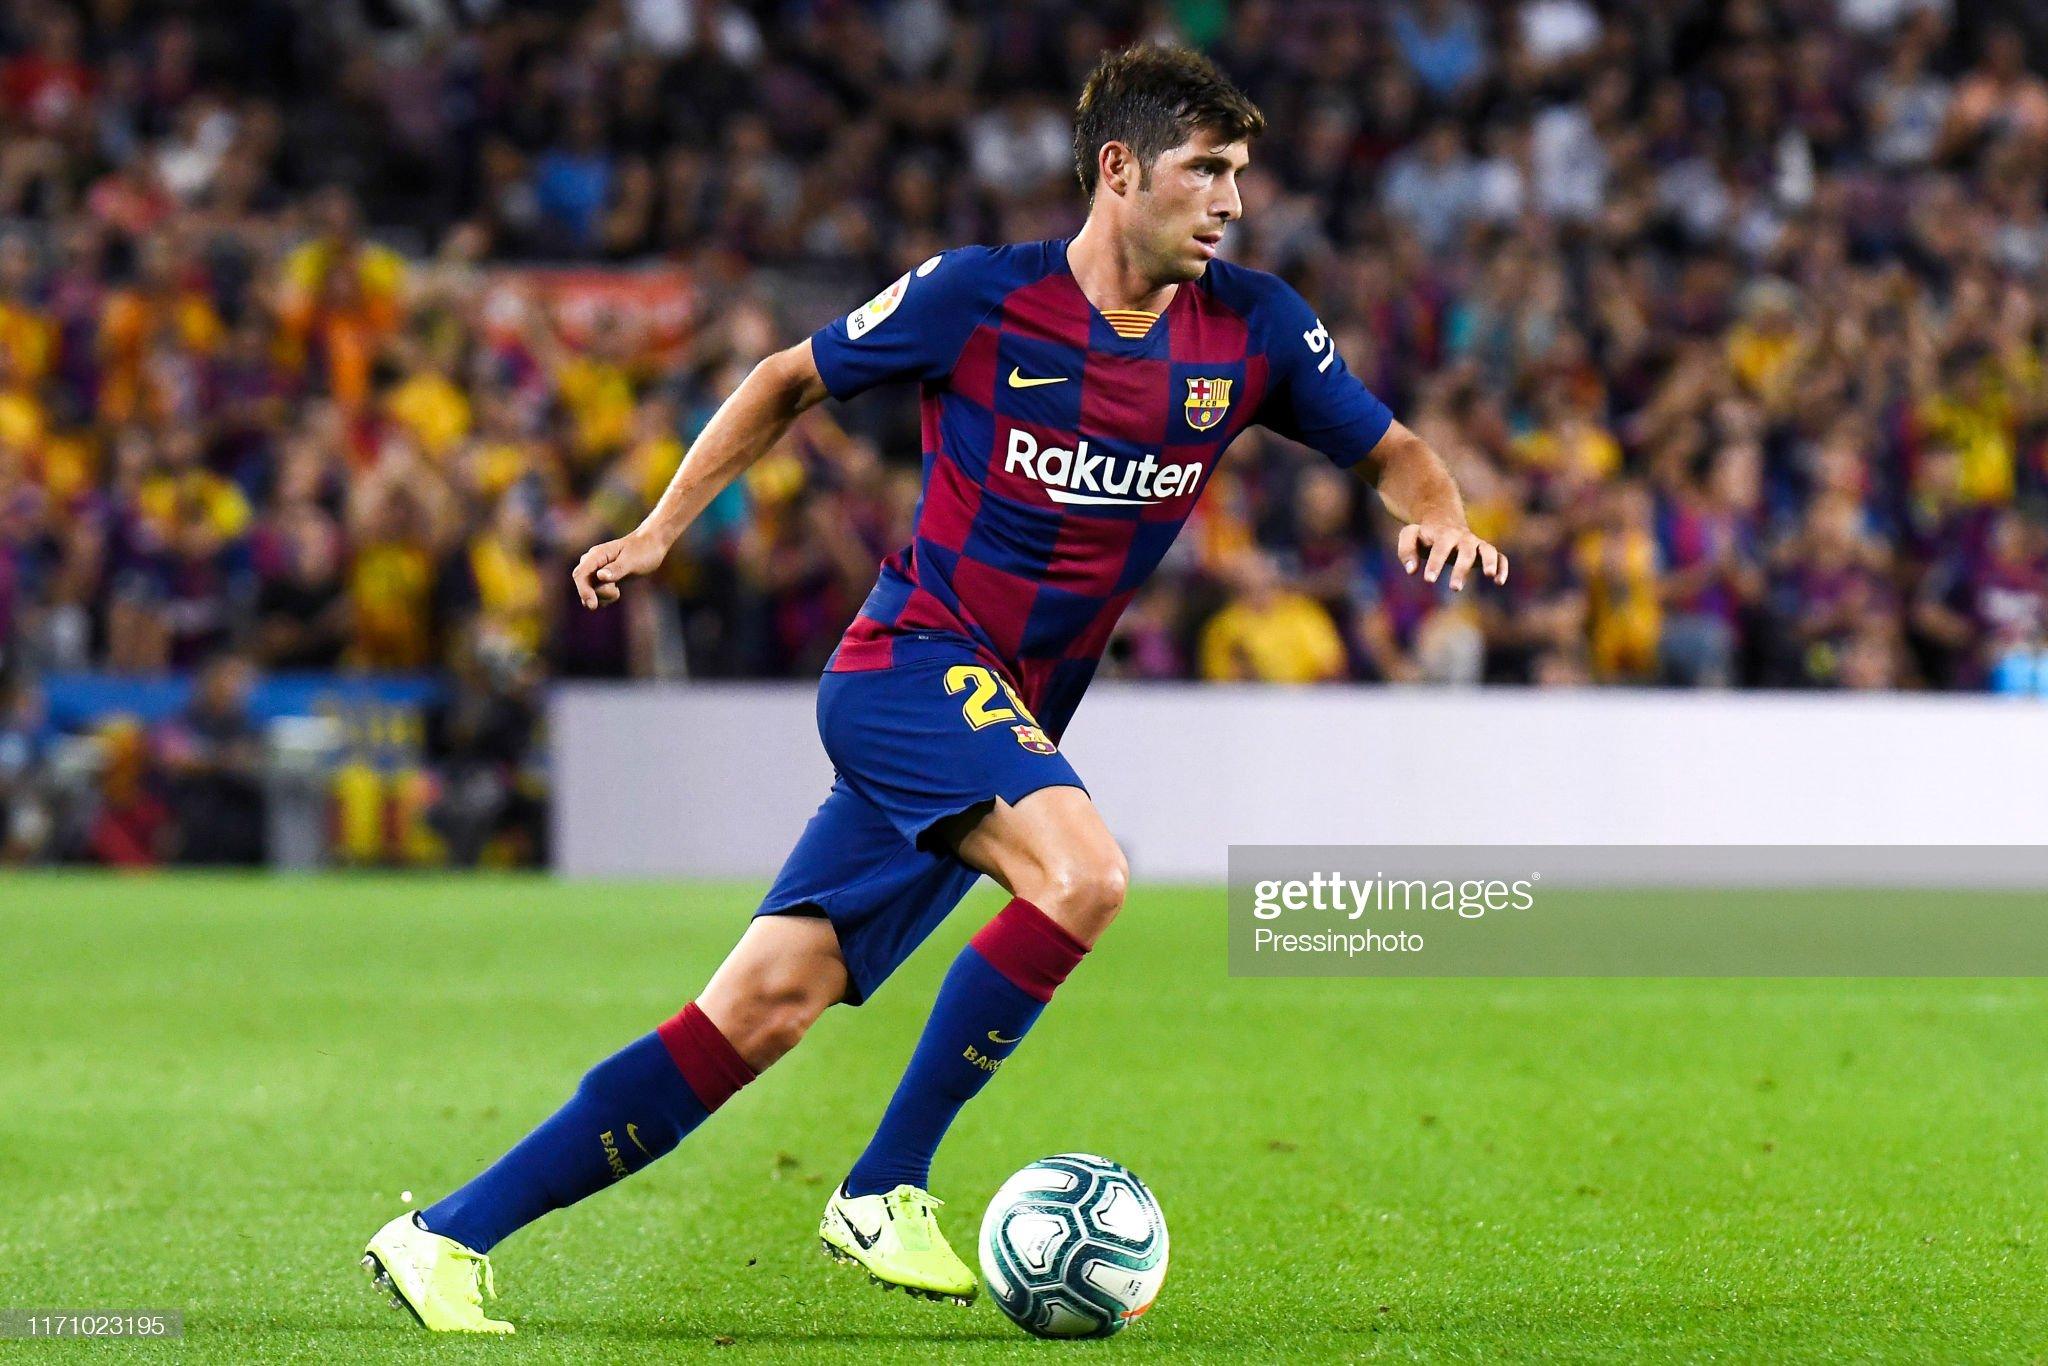 صور مباراة : برشلونة - فياريال 2-1 ( 24-09-2019 )  Sergi-roberto-of-fc-barcelona-during-the-liga-match-between-barcelona-picture-id1171023195?s=2048x2048